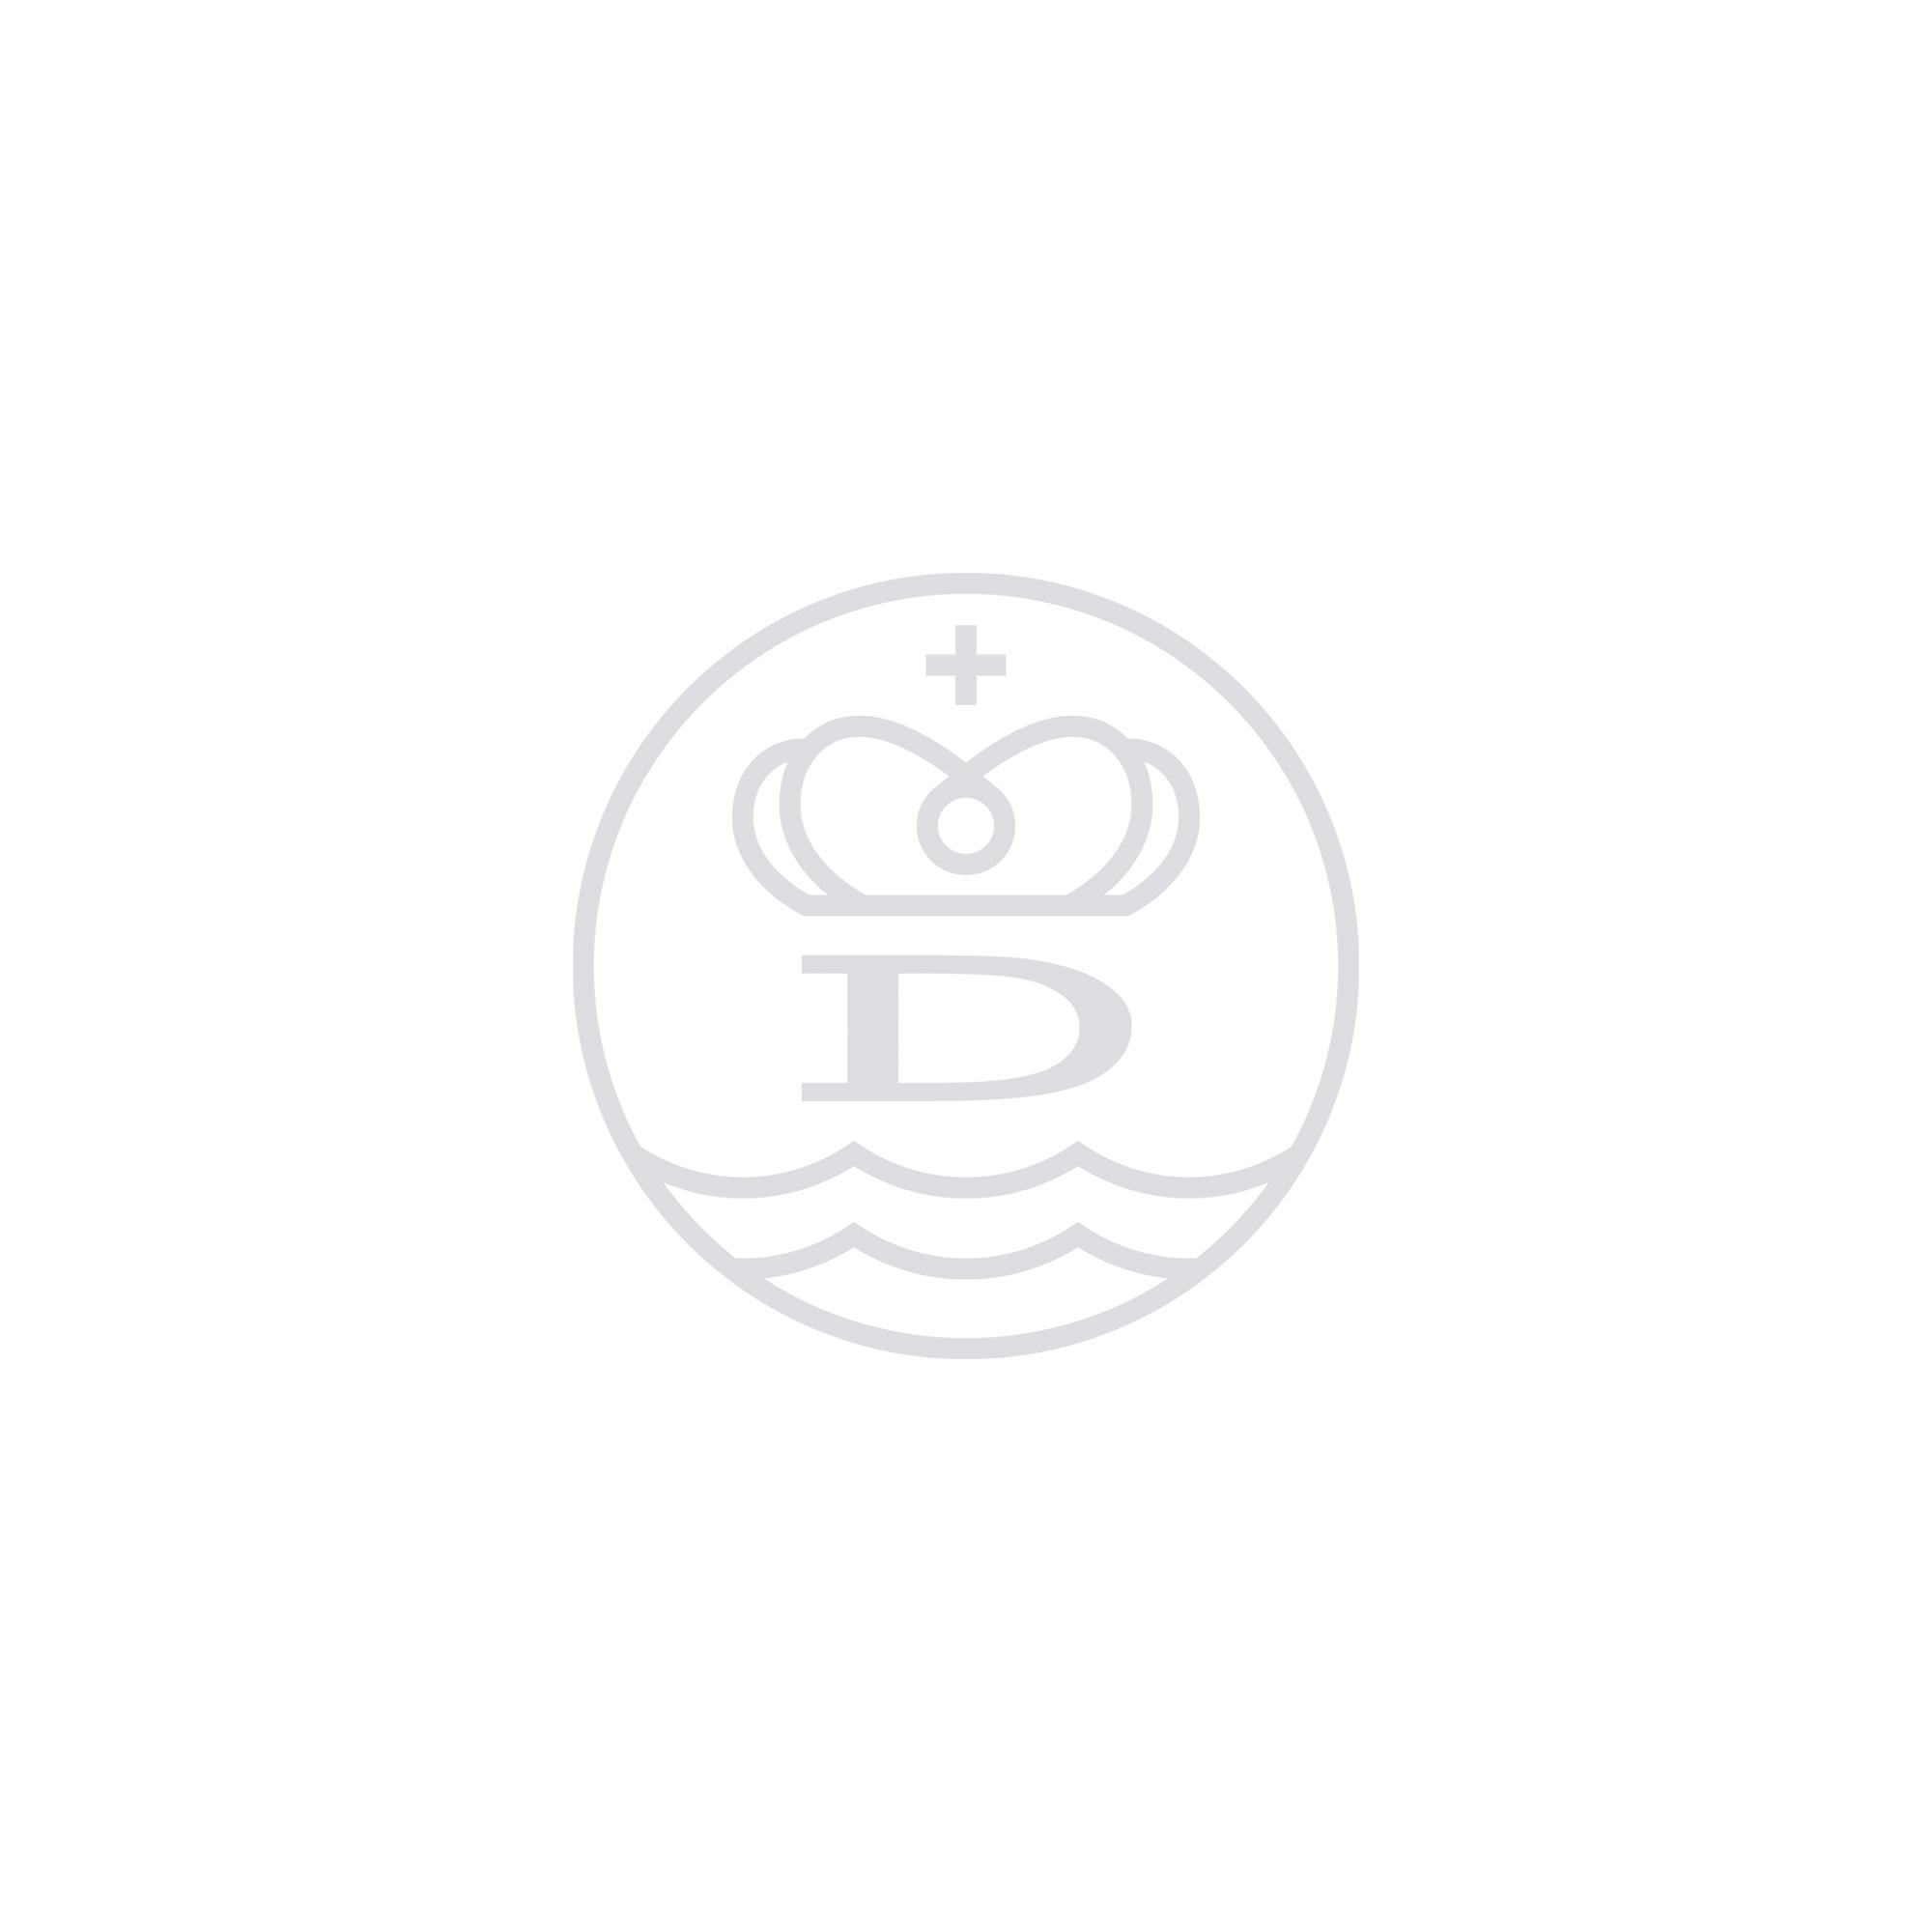 AZORA Silver Aquamarine Ring detailed